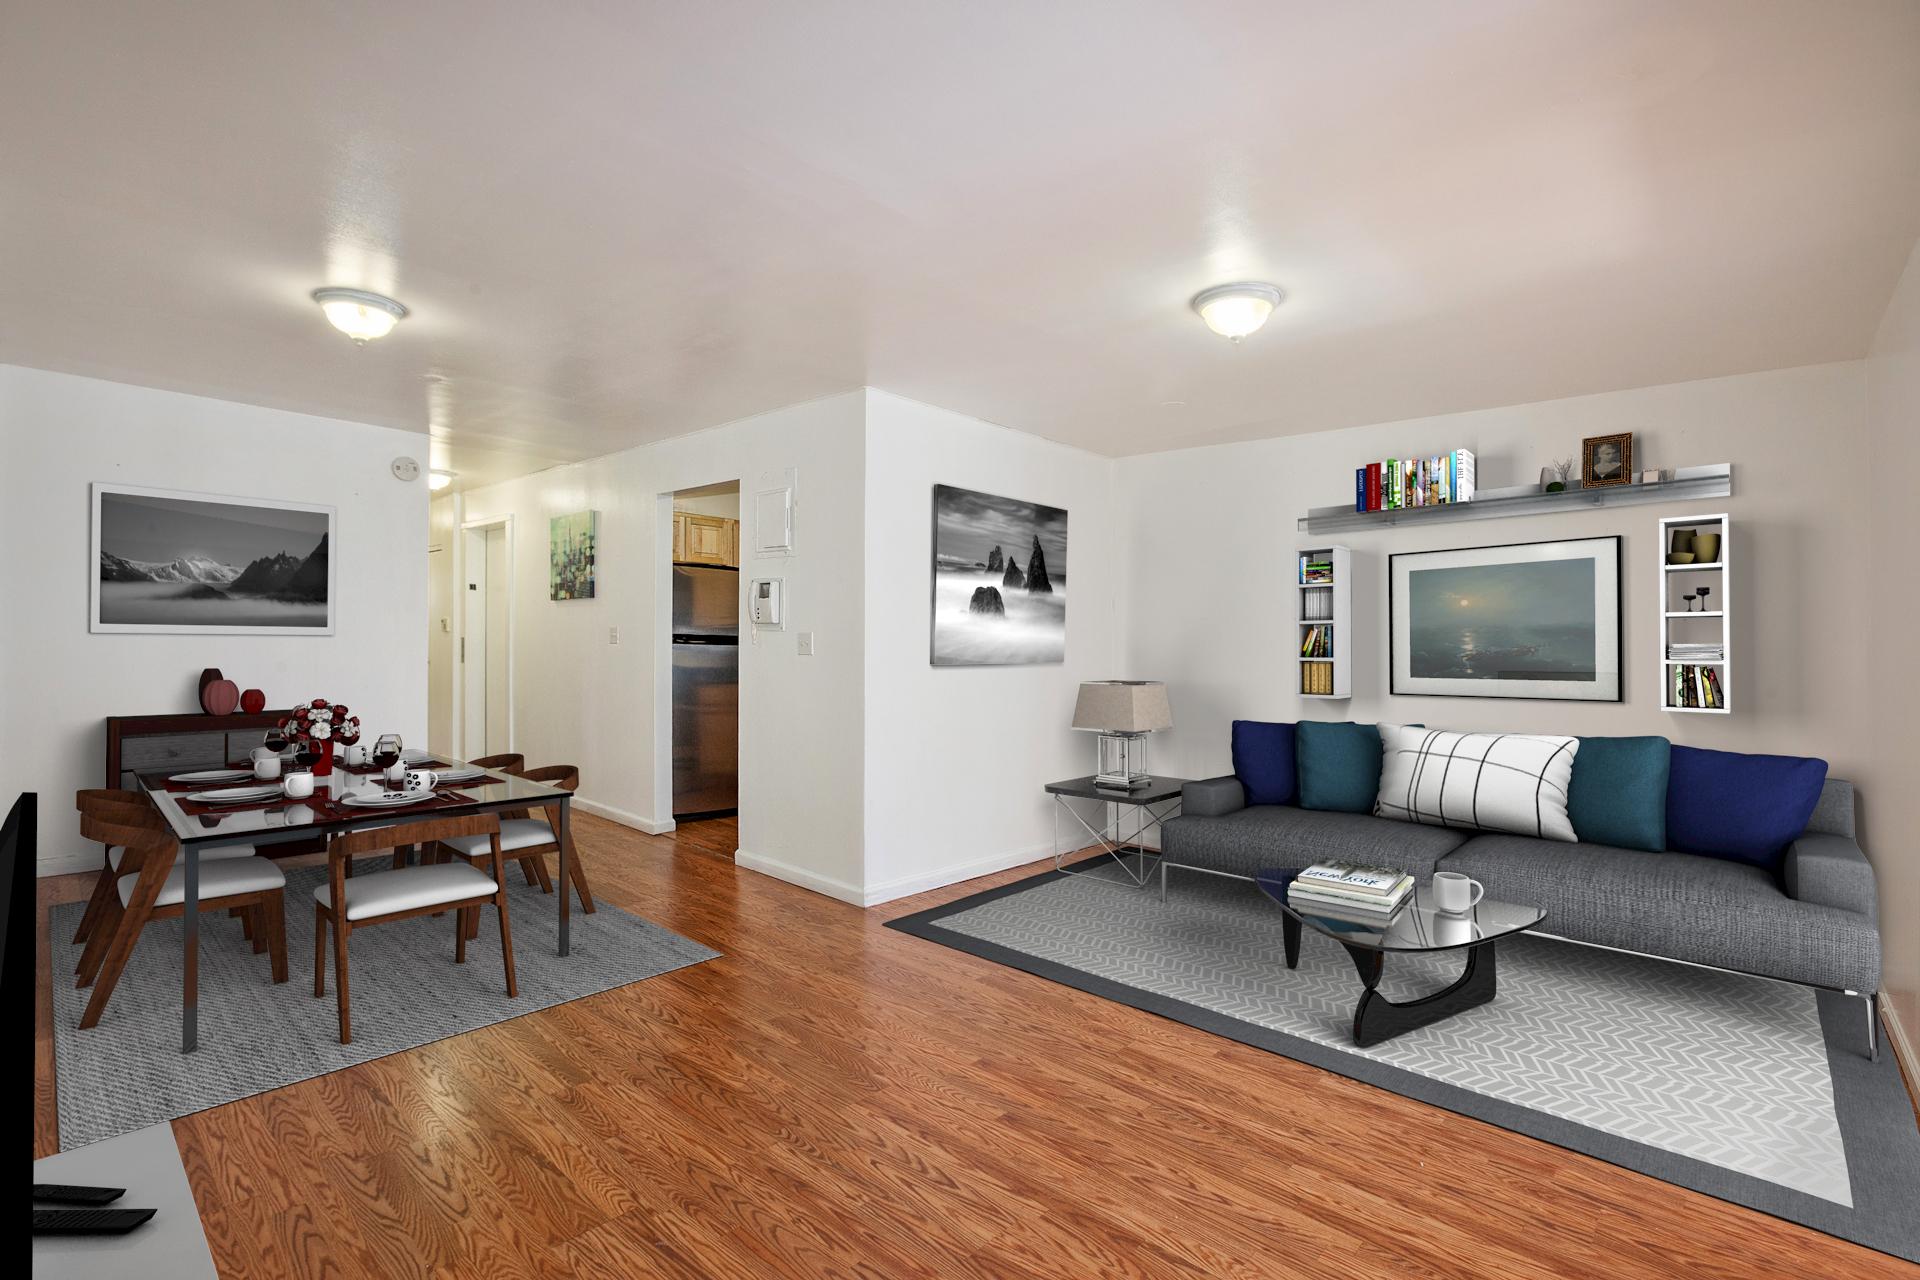 229 East 24th Street, 6th Floor - $1,600,000